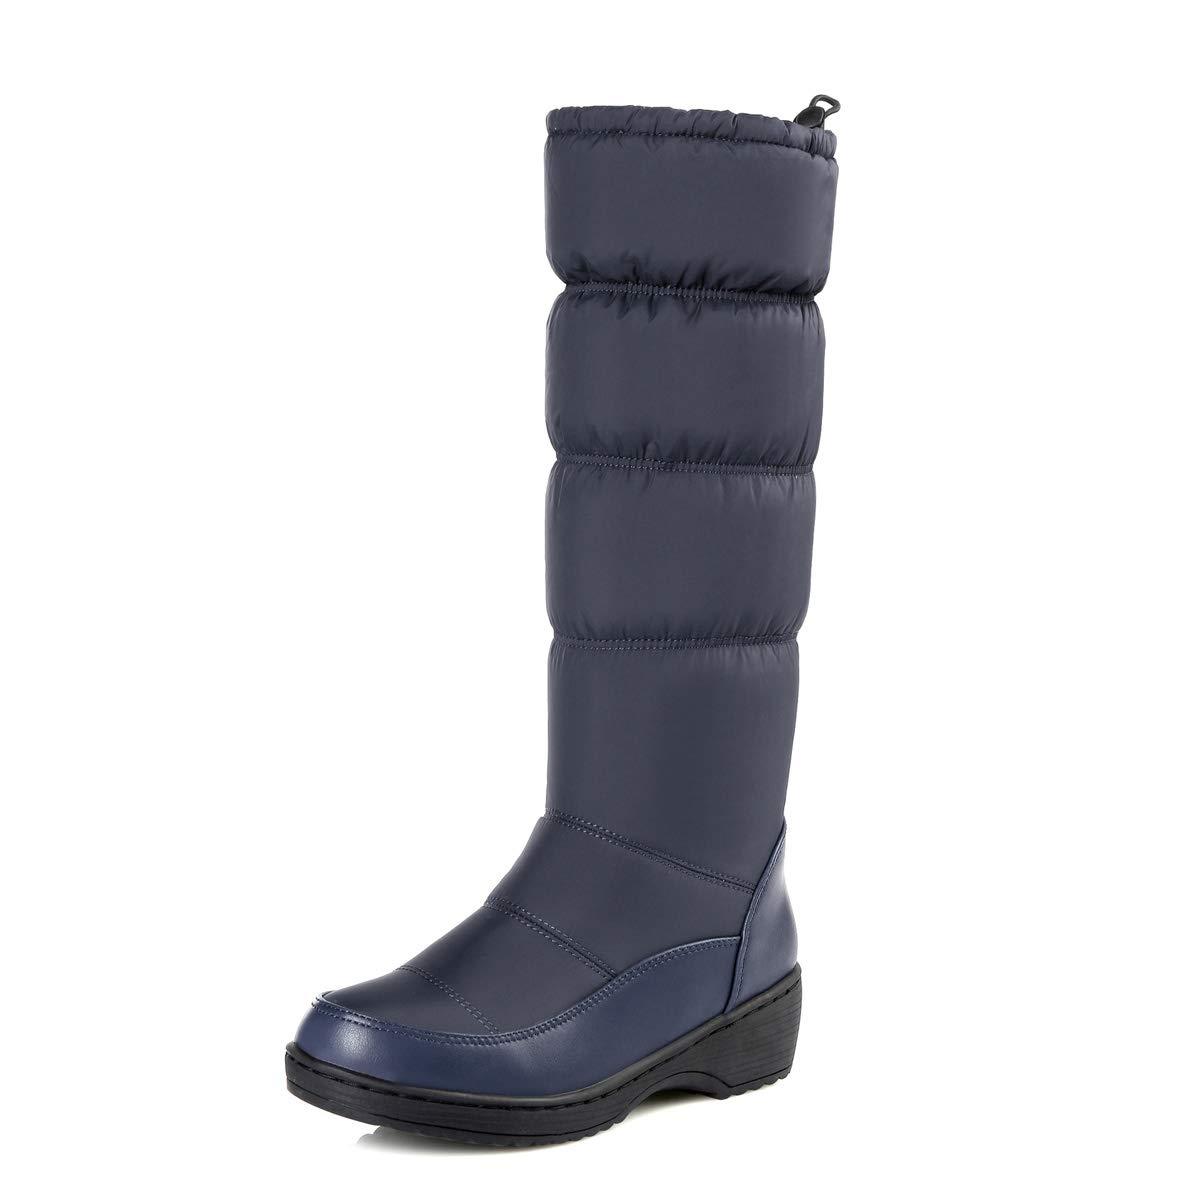 DANDANJIE Damen Schneeschuhe Kalb Biker Stiefel Stiefel Stiefel Damen Winter Warm Rutschfeste Mid-Calf Stiefel (Balck Blau Weiß),Blau,36EU  604c5f